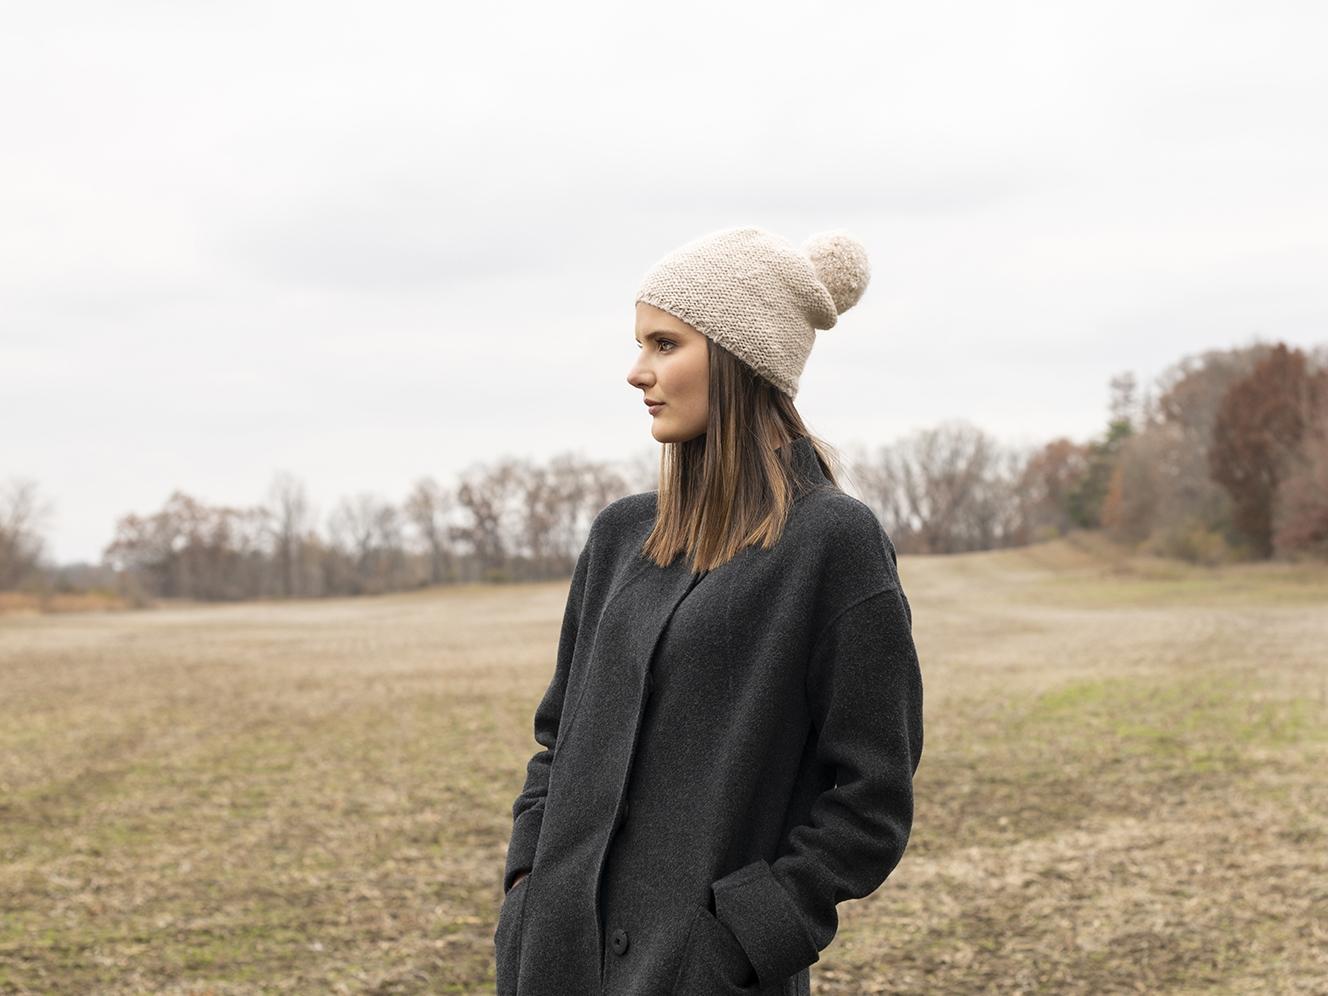 Vite Hat - Knitting pattern by Julie Hoover